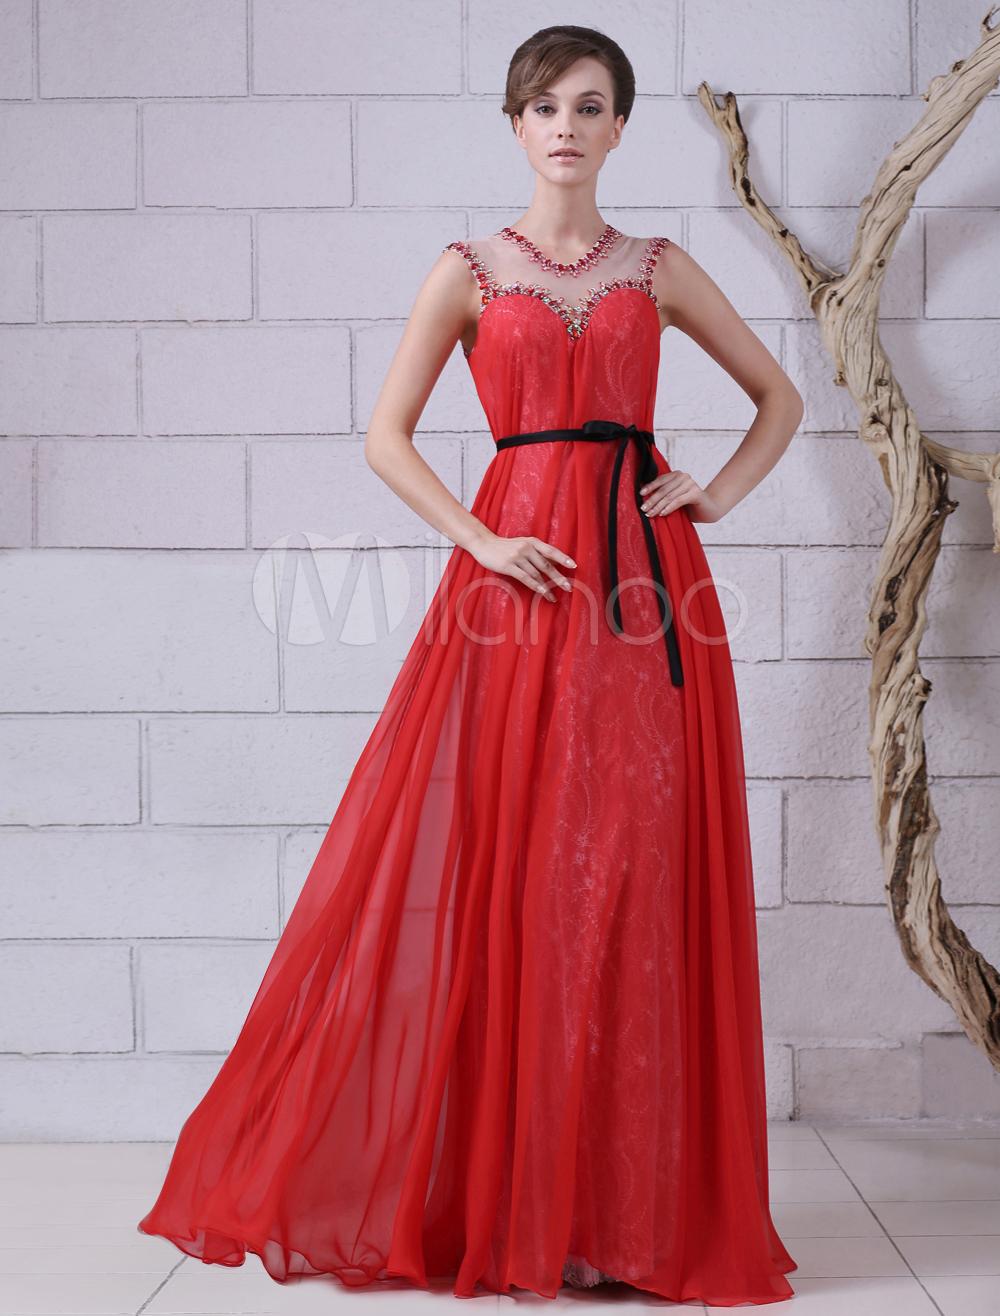 Buy Red Jewel Neck Beading A-line Sleeveless Chiffon Evening Dress Milanoo for $173.69 in Milanoo store